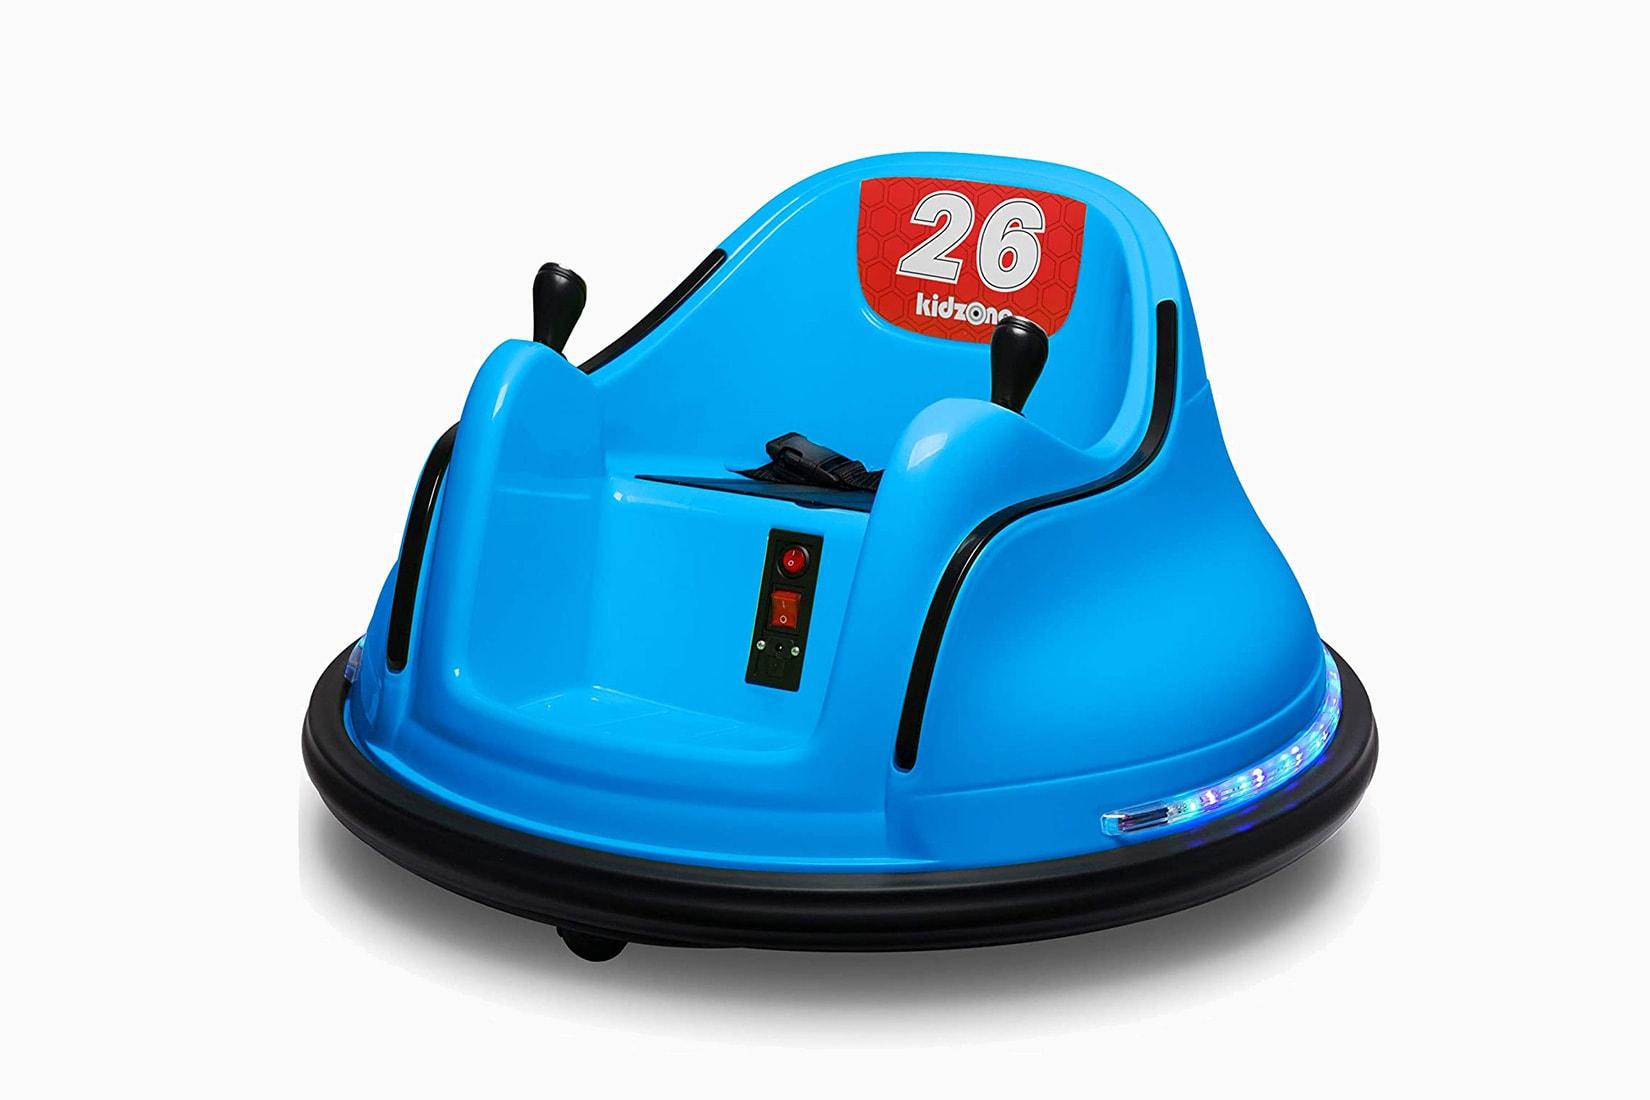 best electric cars kids kidzone indoor ride-on - Luxe Digital